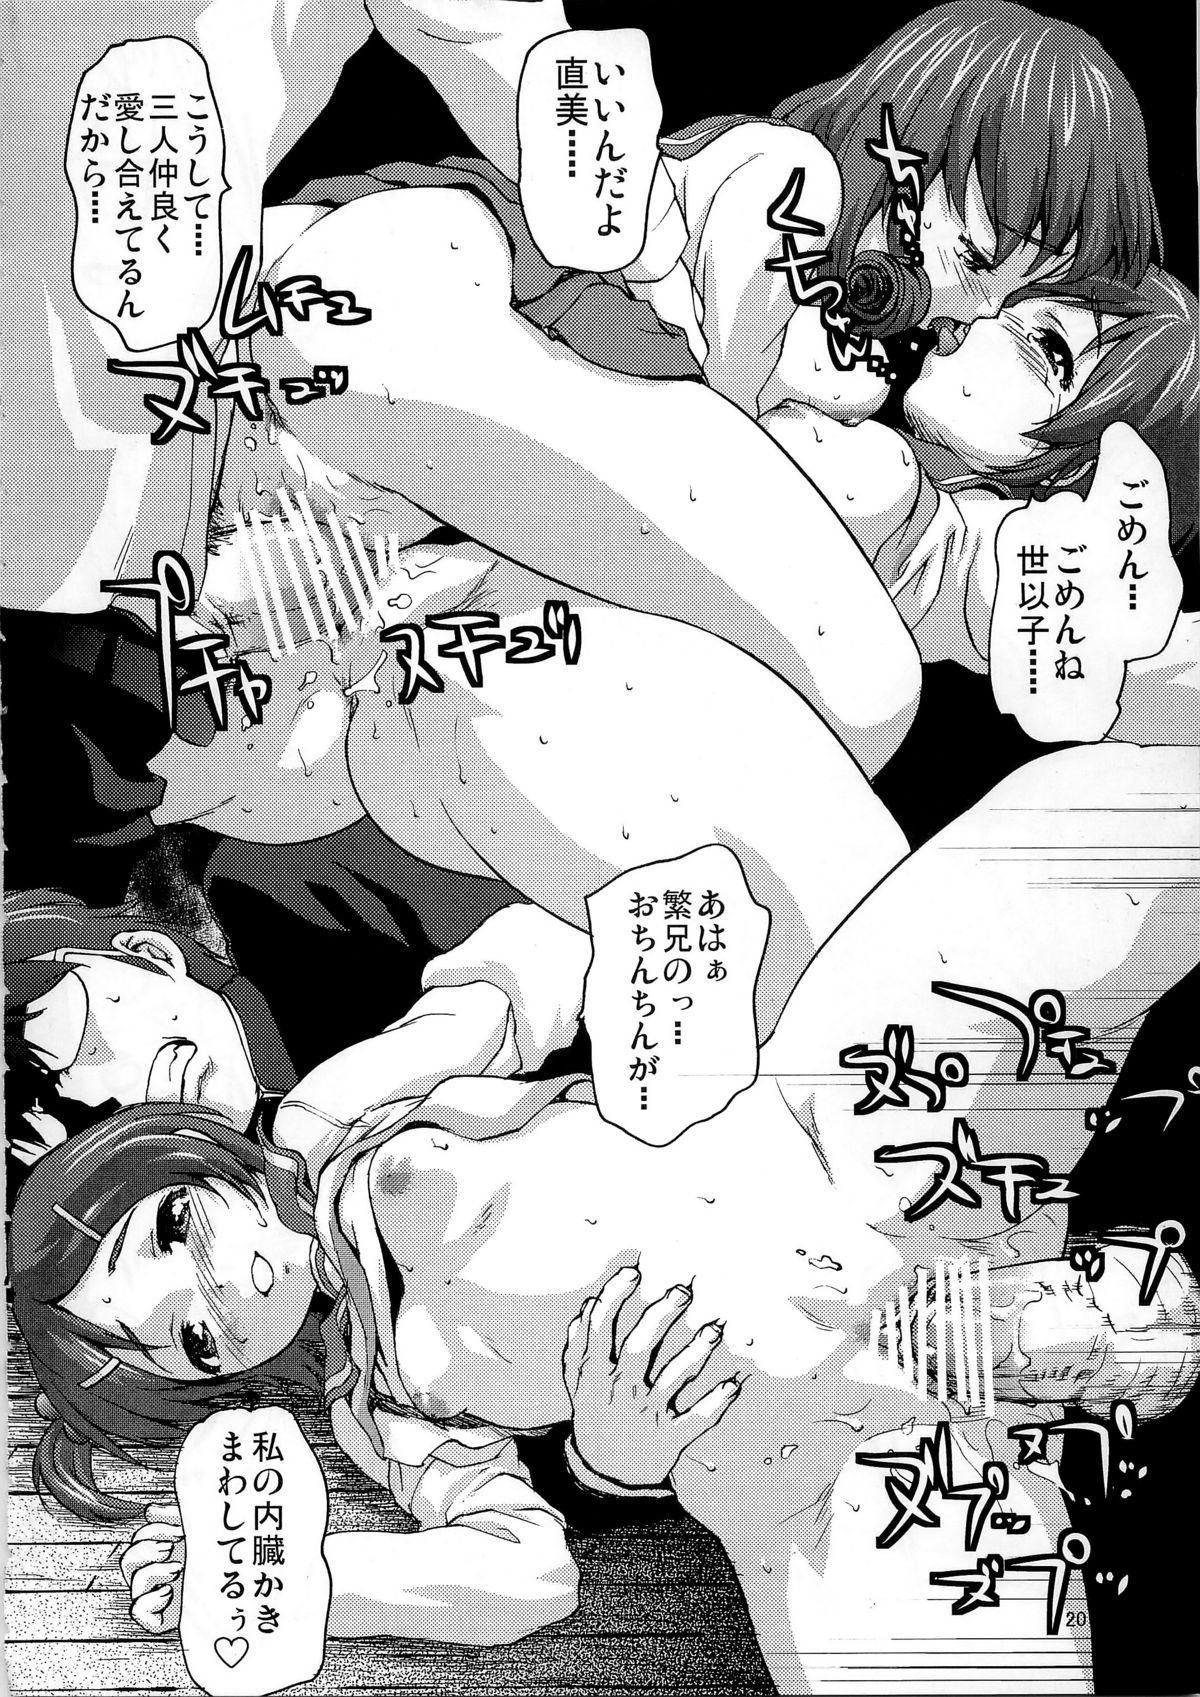 Ura EX chapter 19